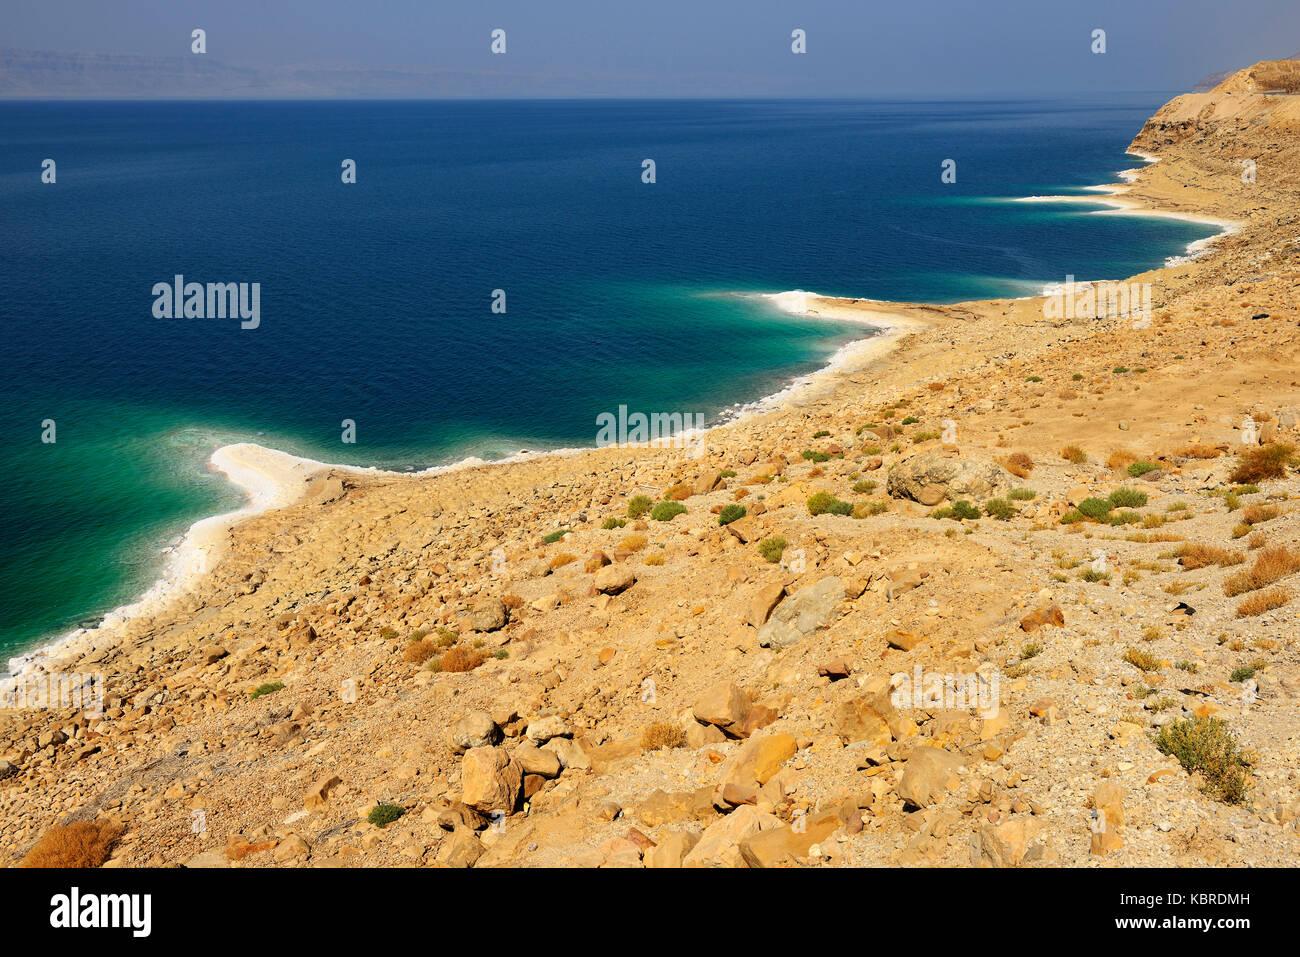 Mer Morte, Jordanie Photo Stock